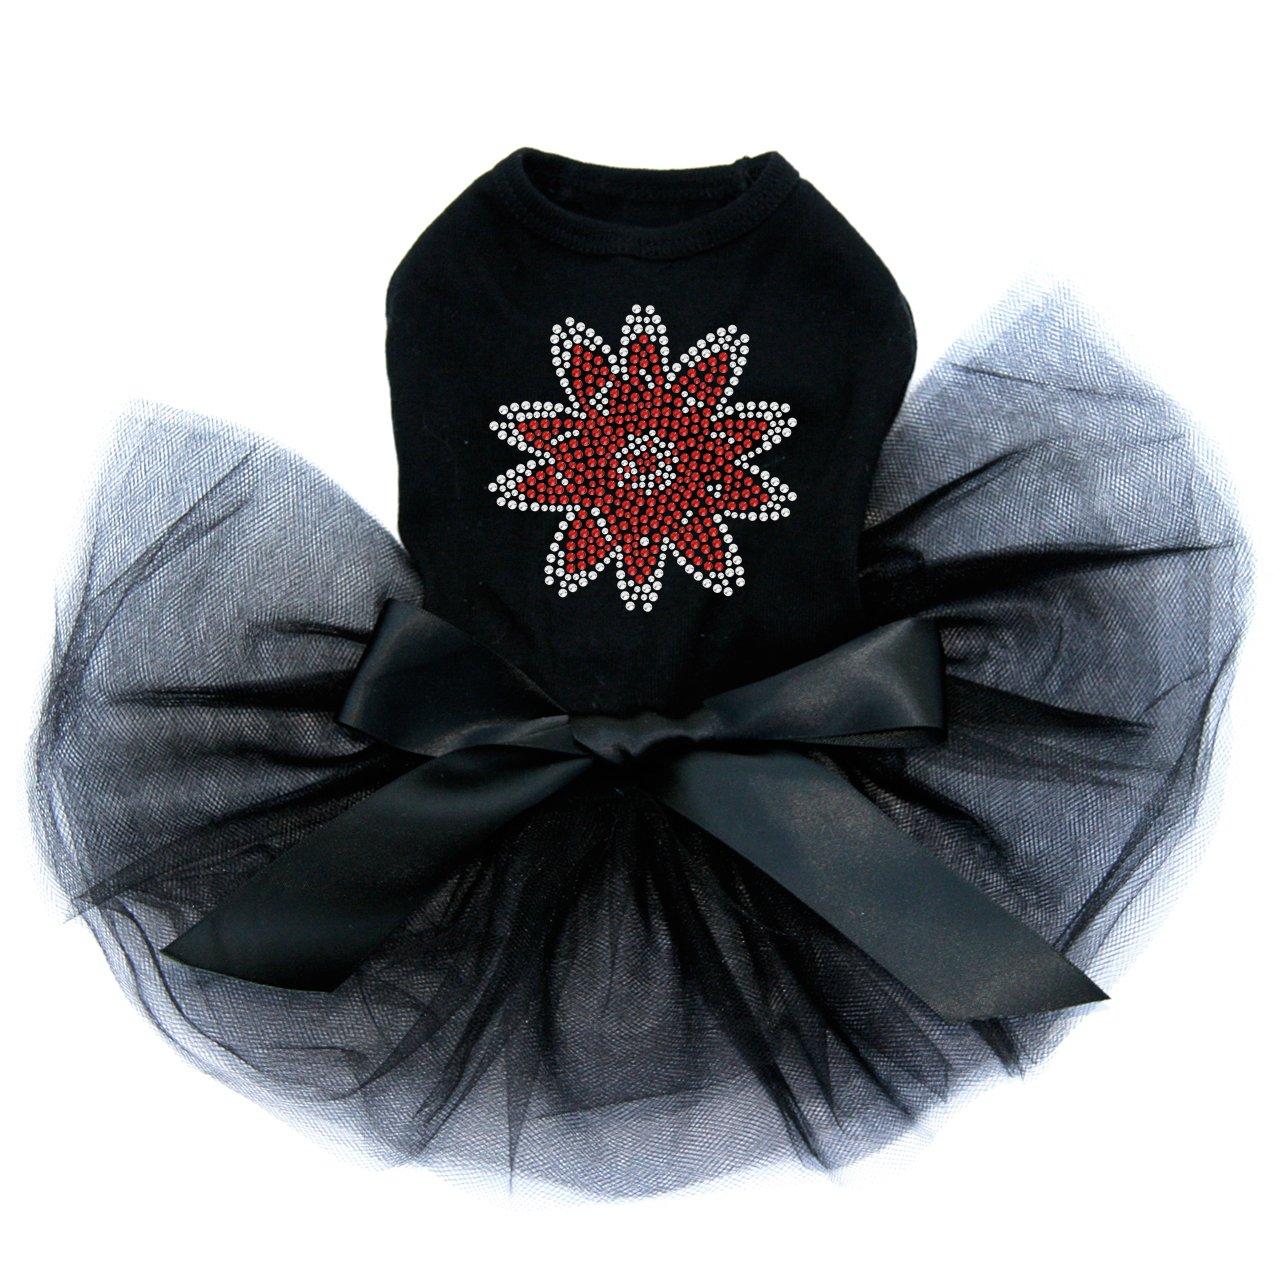 Red Rhinestone Flower - Bling Rhinestone Dog Tutu Dress, S Black by Dog in the Closet